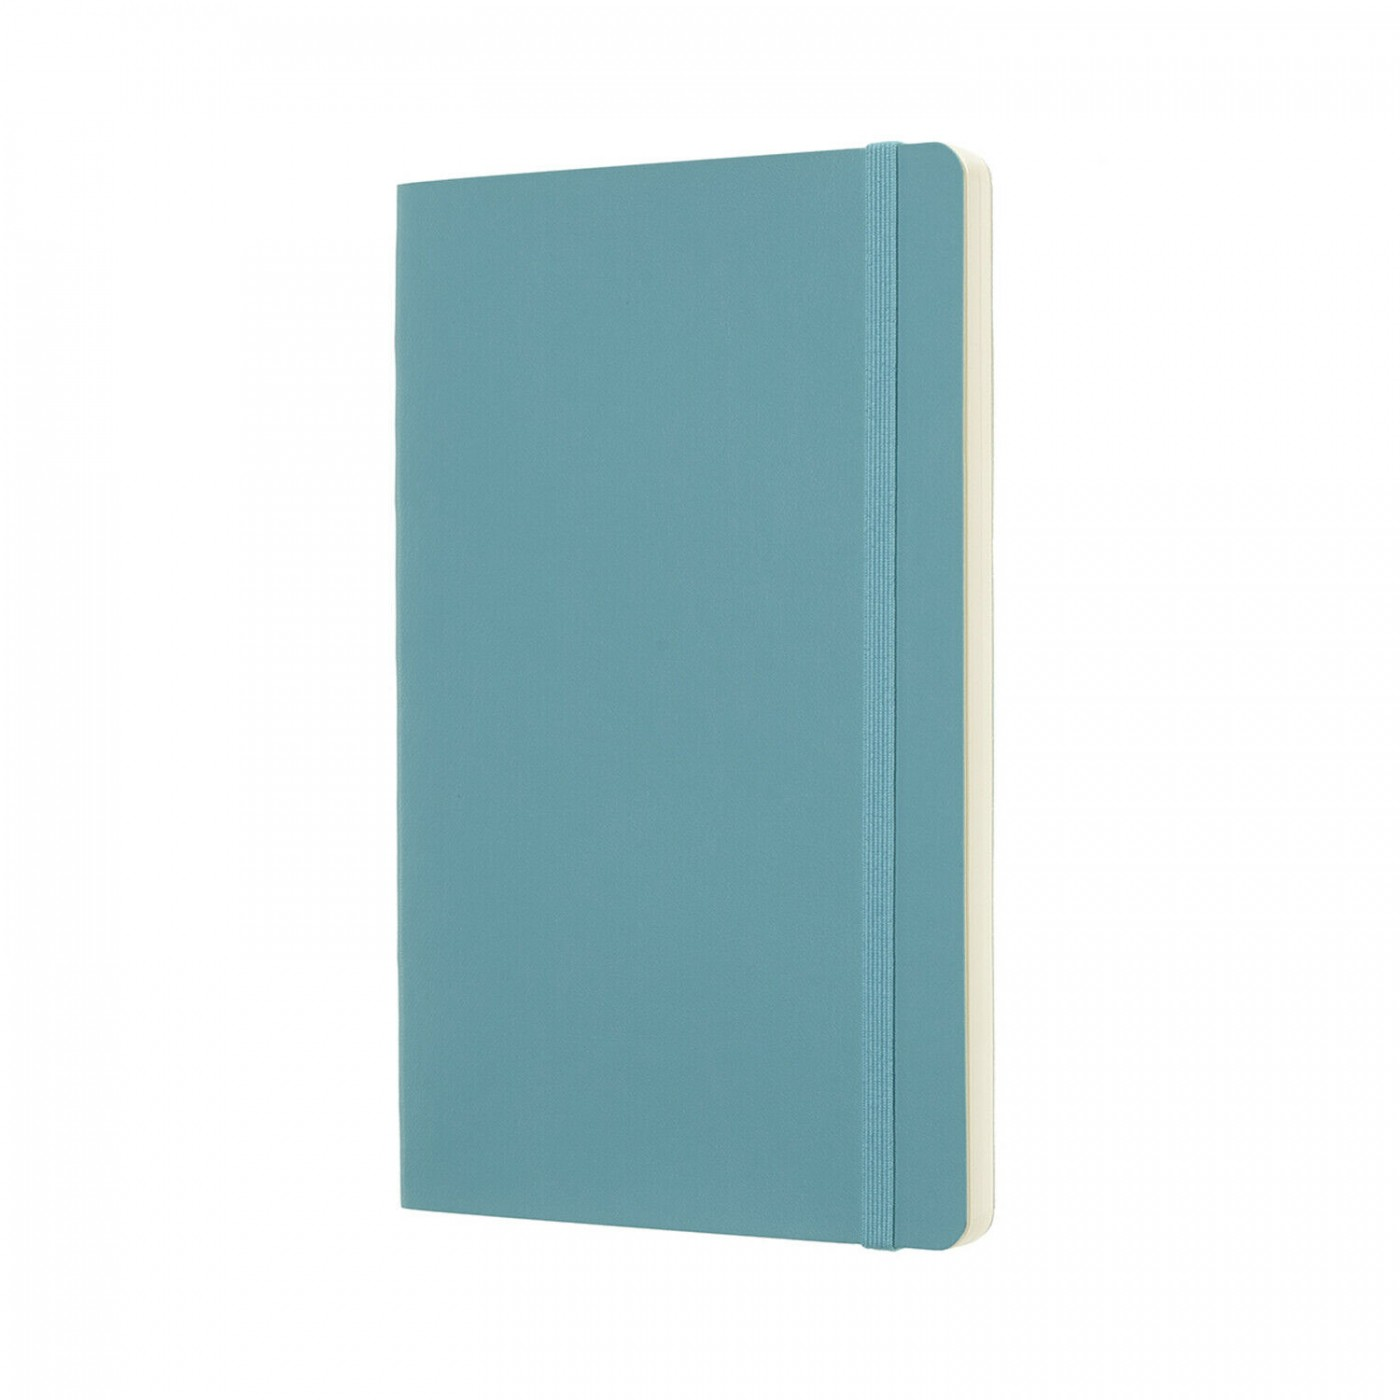 MOLESKINE taccuino Classic, large, copertina morbida azzurro